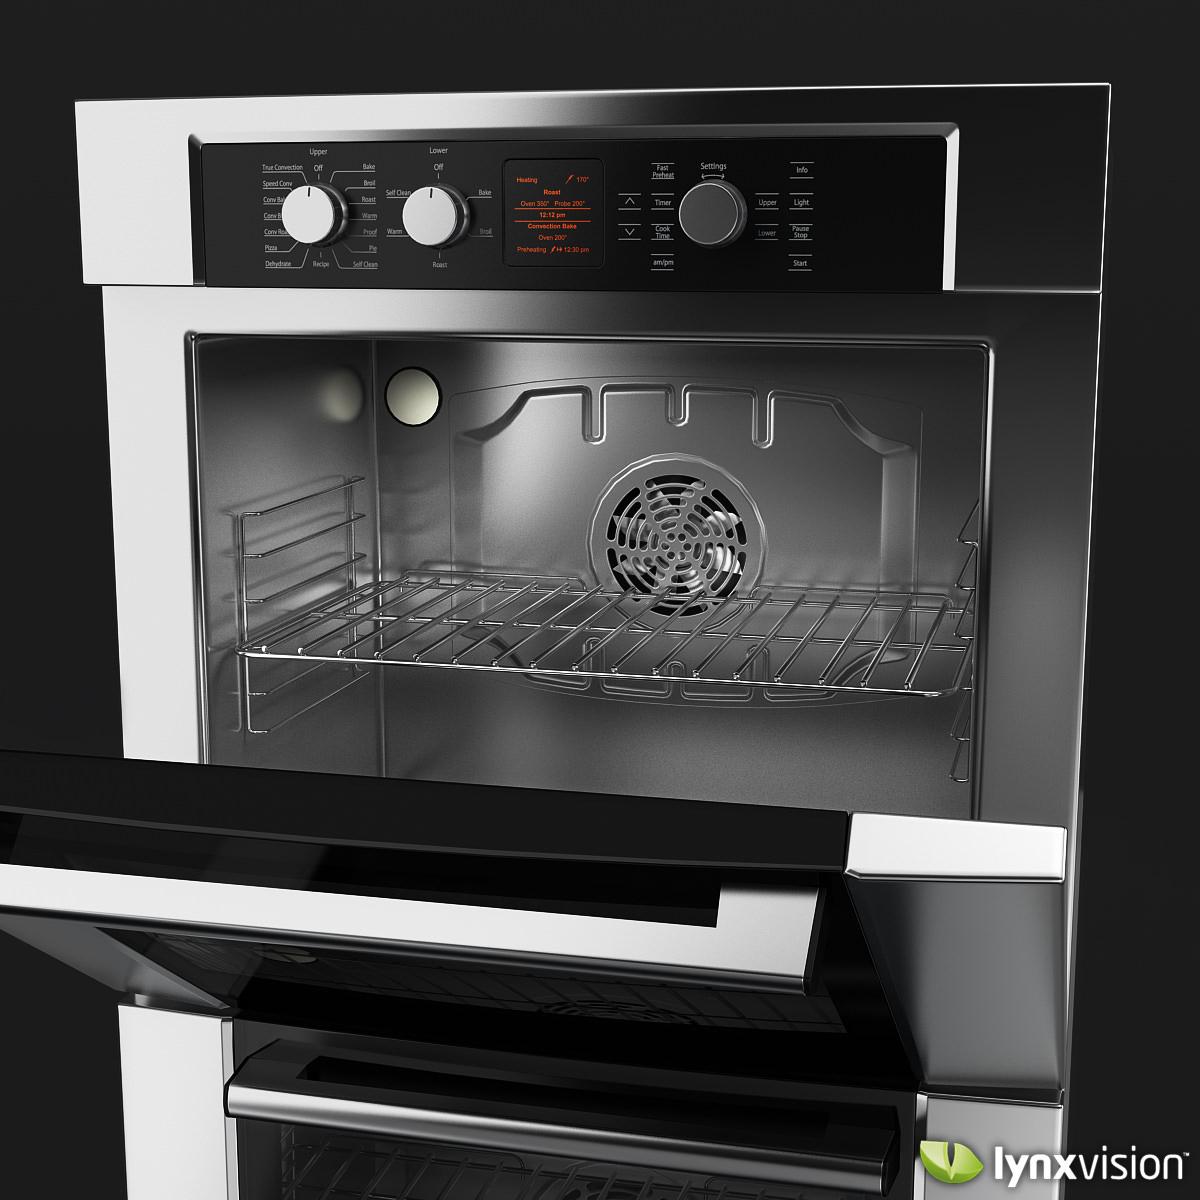 bosch 300 series double oven 3d model max obj fbx. Black Bedroom Furniture Sets. Home Design Ideas